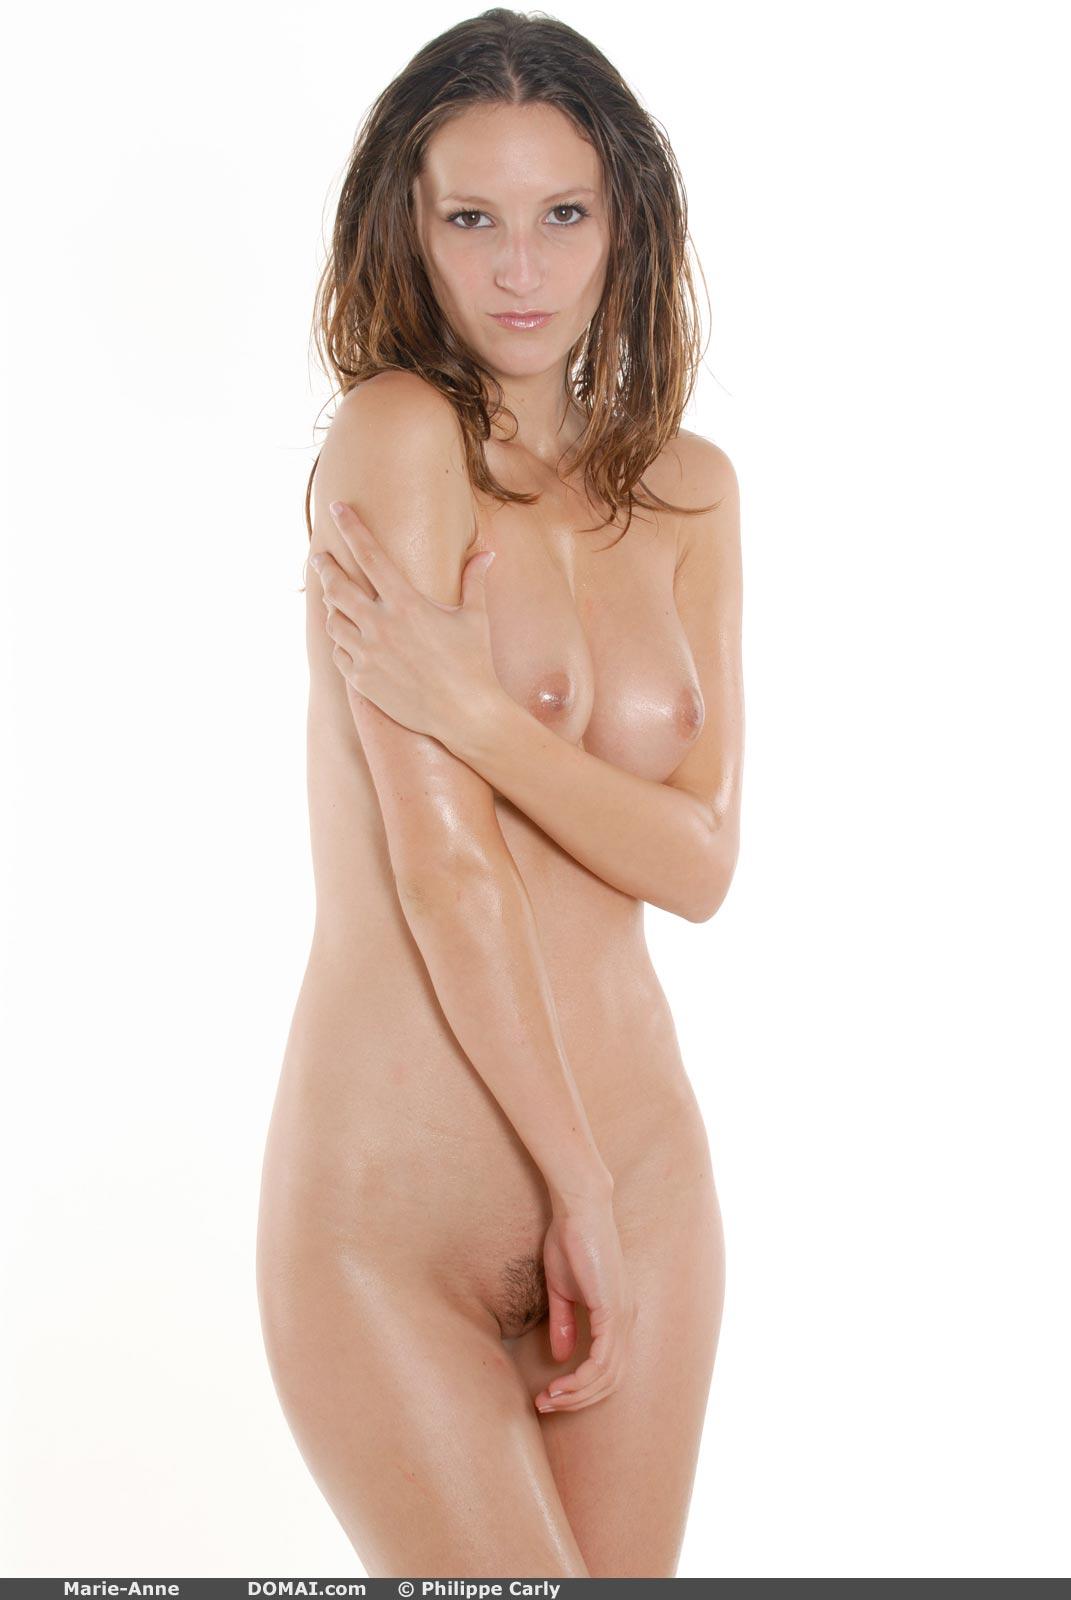 Bollywood domai girls porn sexy pics, frenvh girl squirt gif